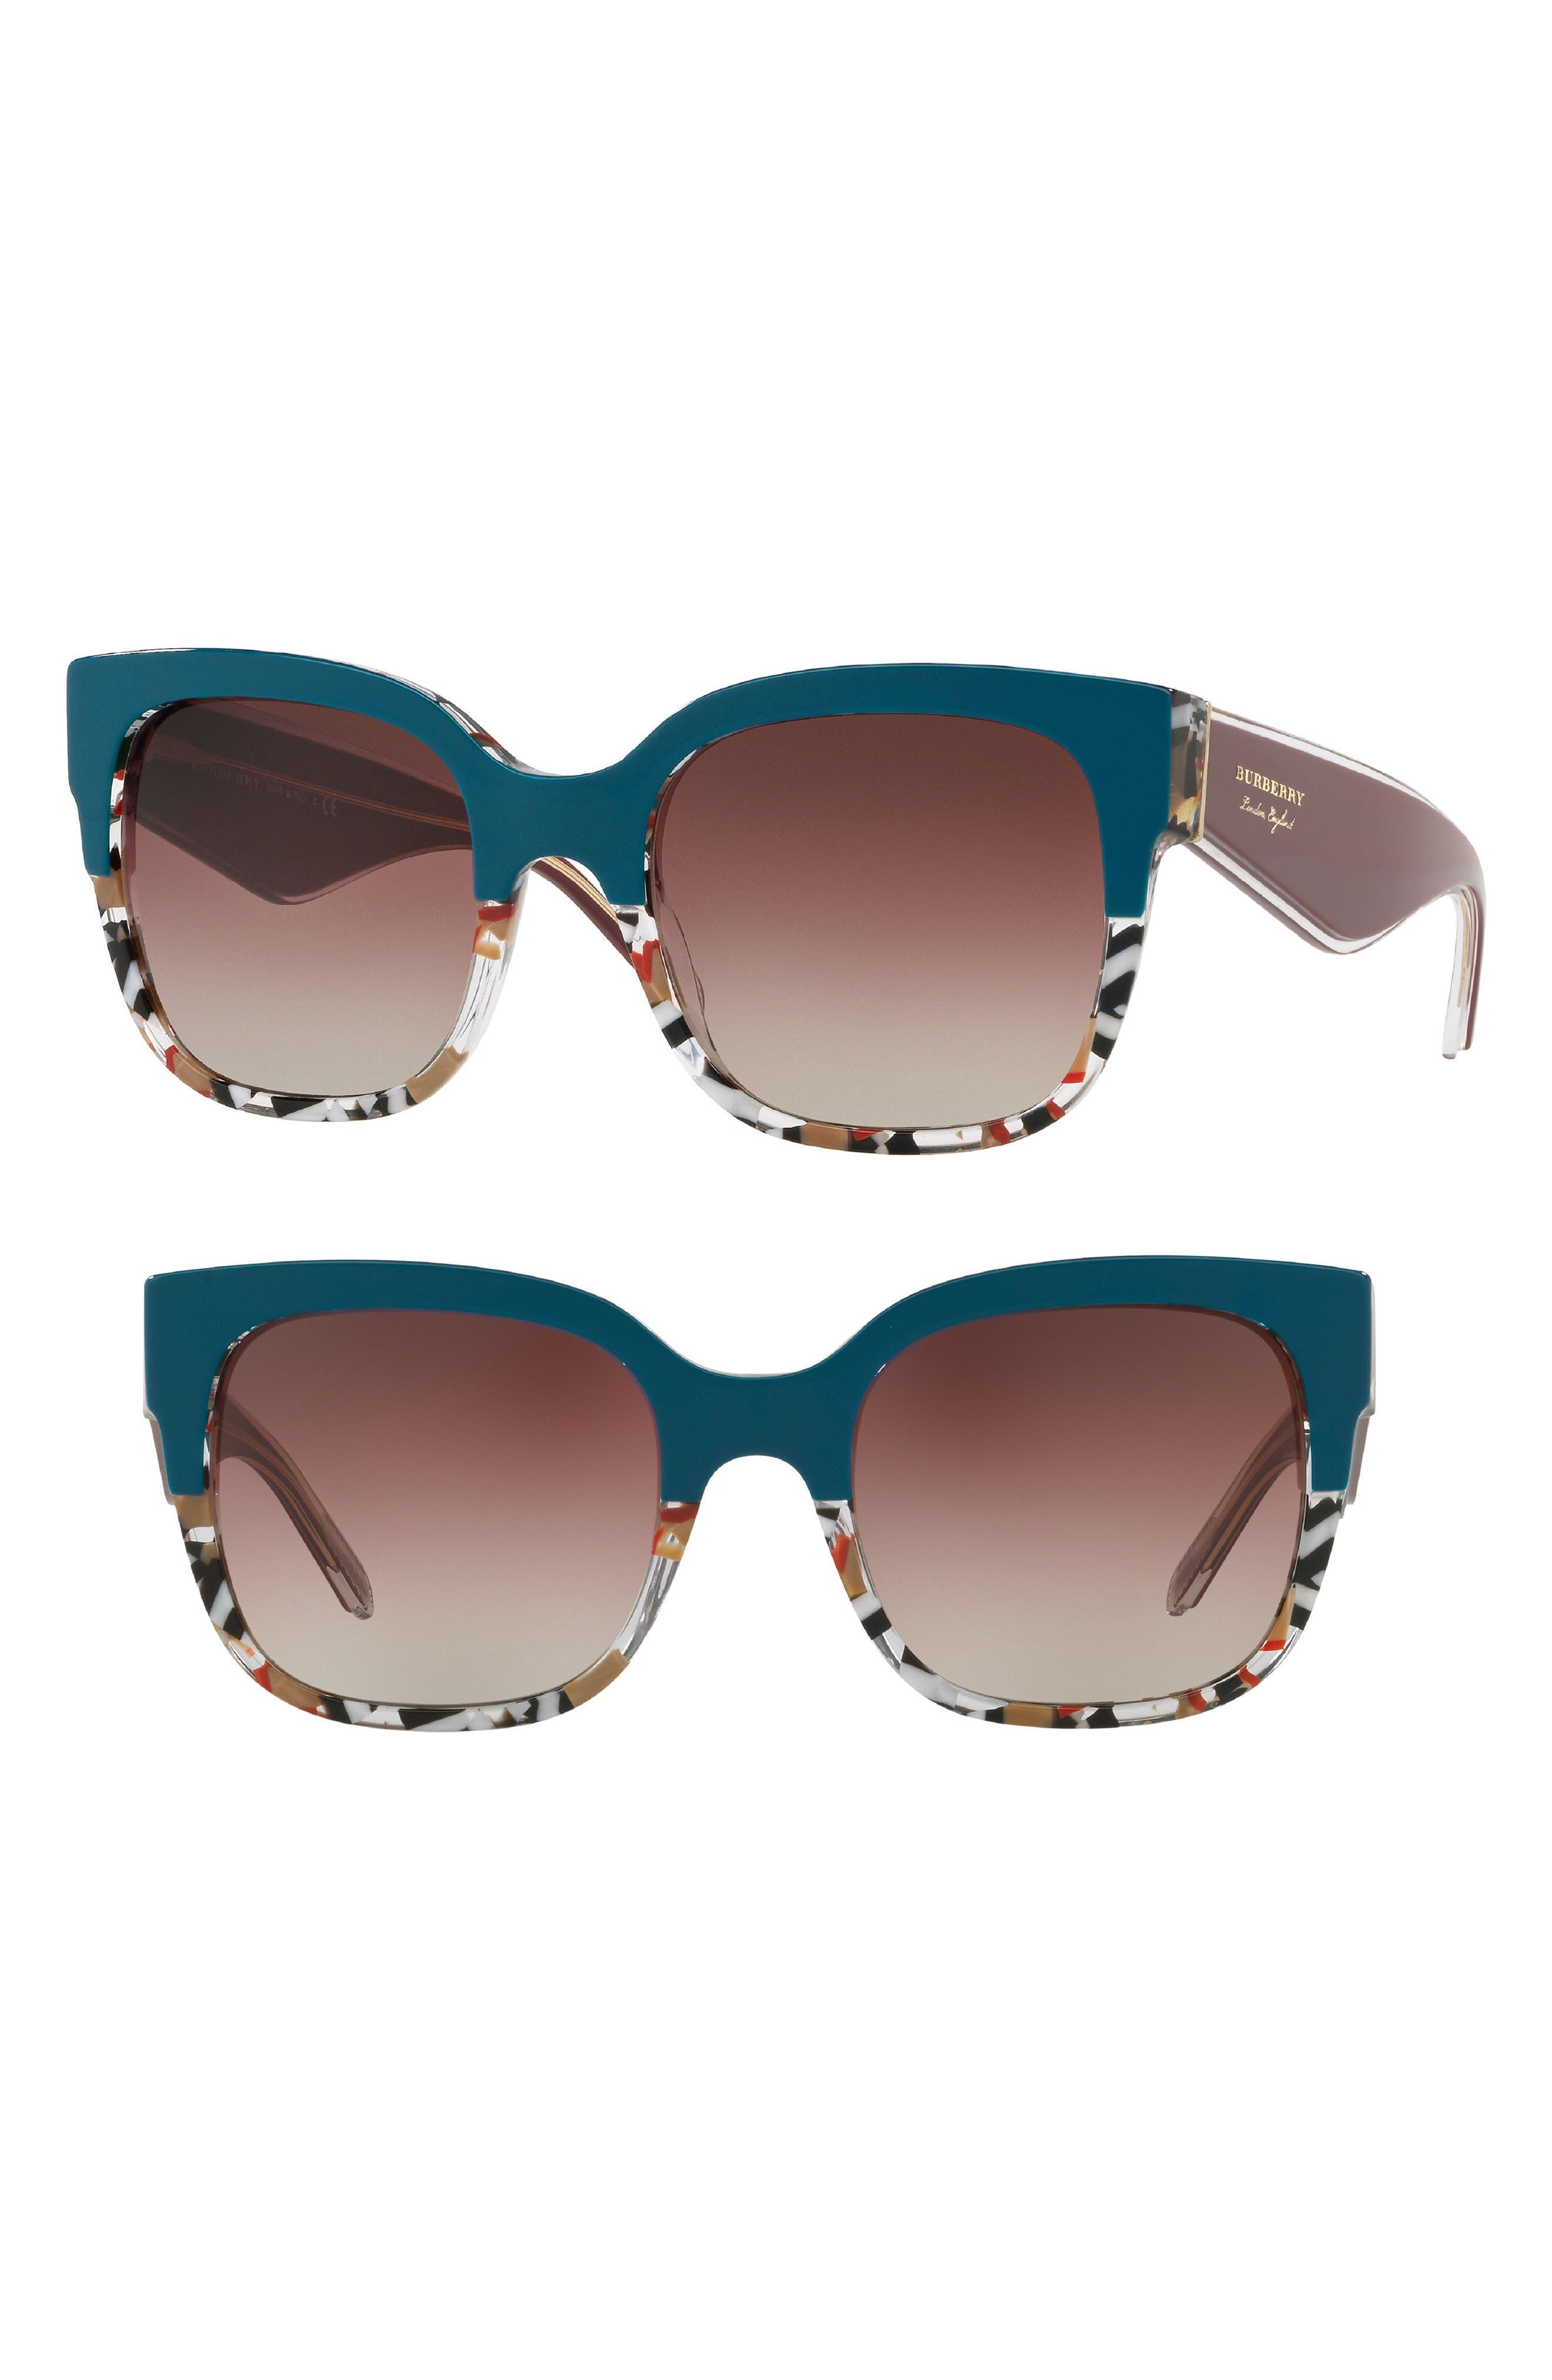 56mm Cat Eye Sunglasses,                         Main,                         color, DARK GREEN GRADIENT